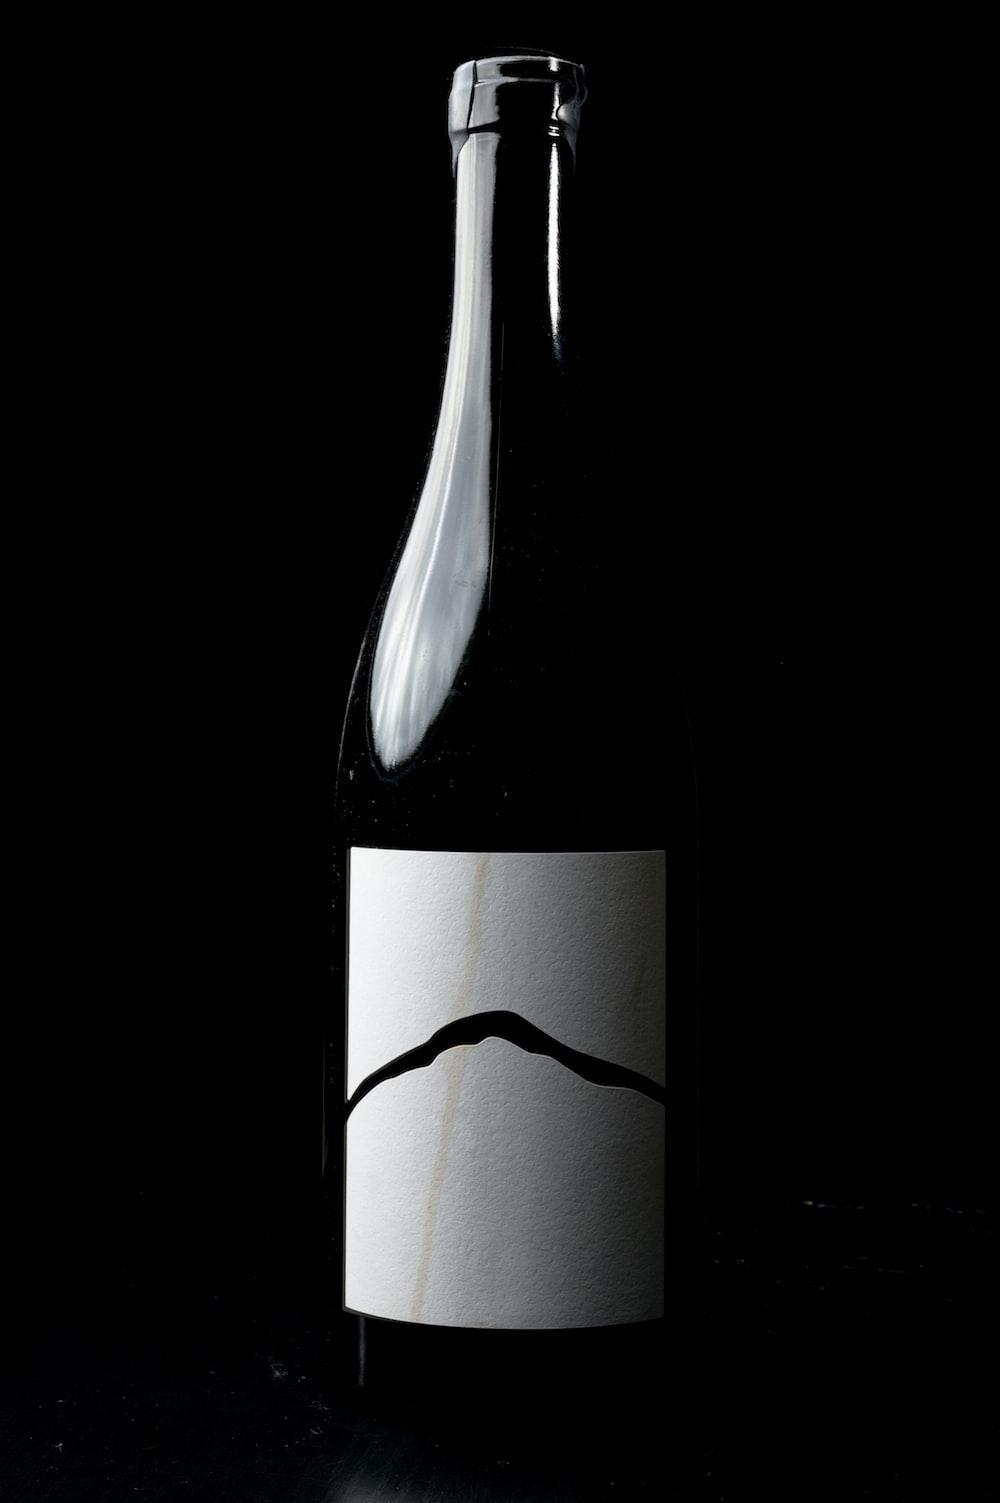 empty labeled bottle